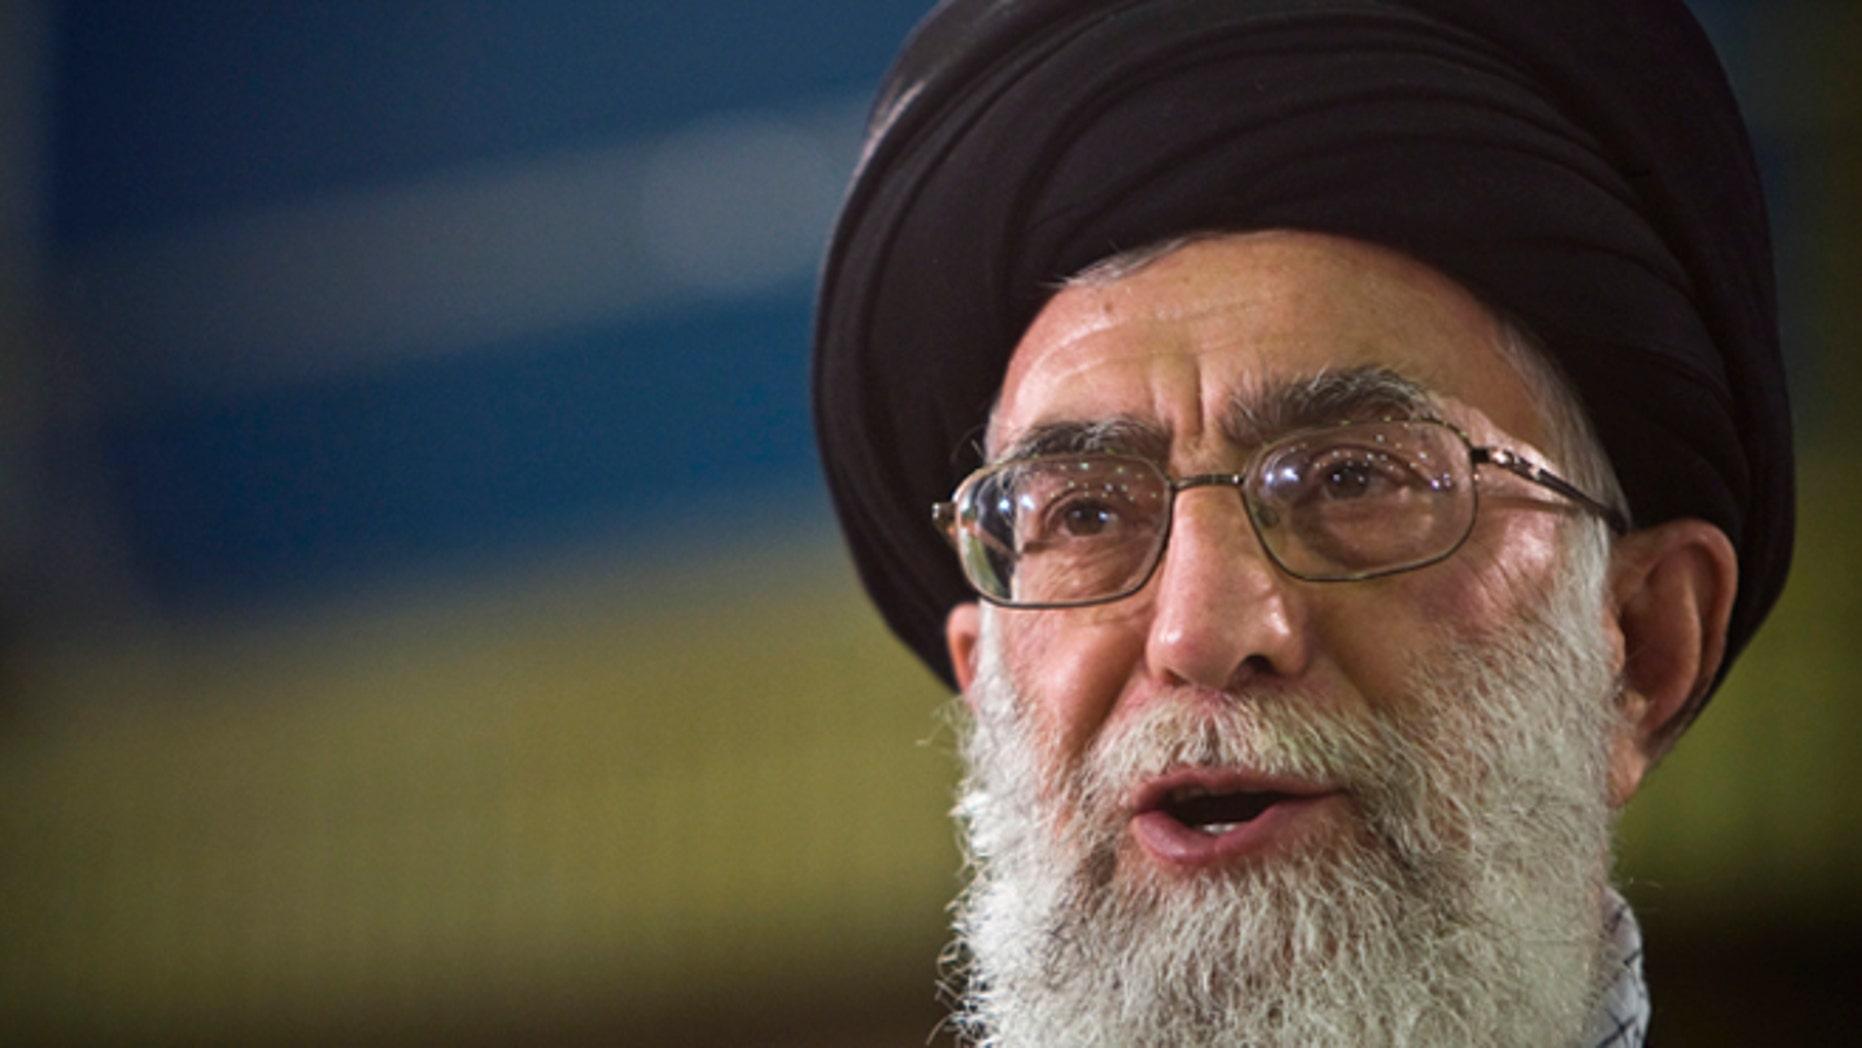 June 12, 2009: Supreme Leader Ayatollah Ali Khamenei speaks live on television in Iran.